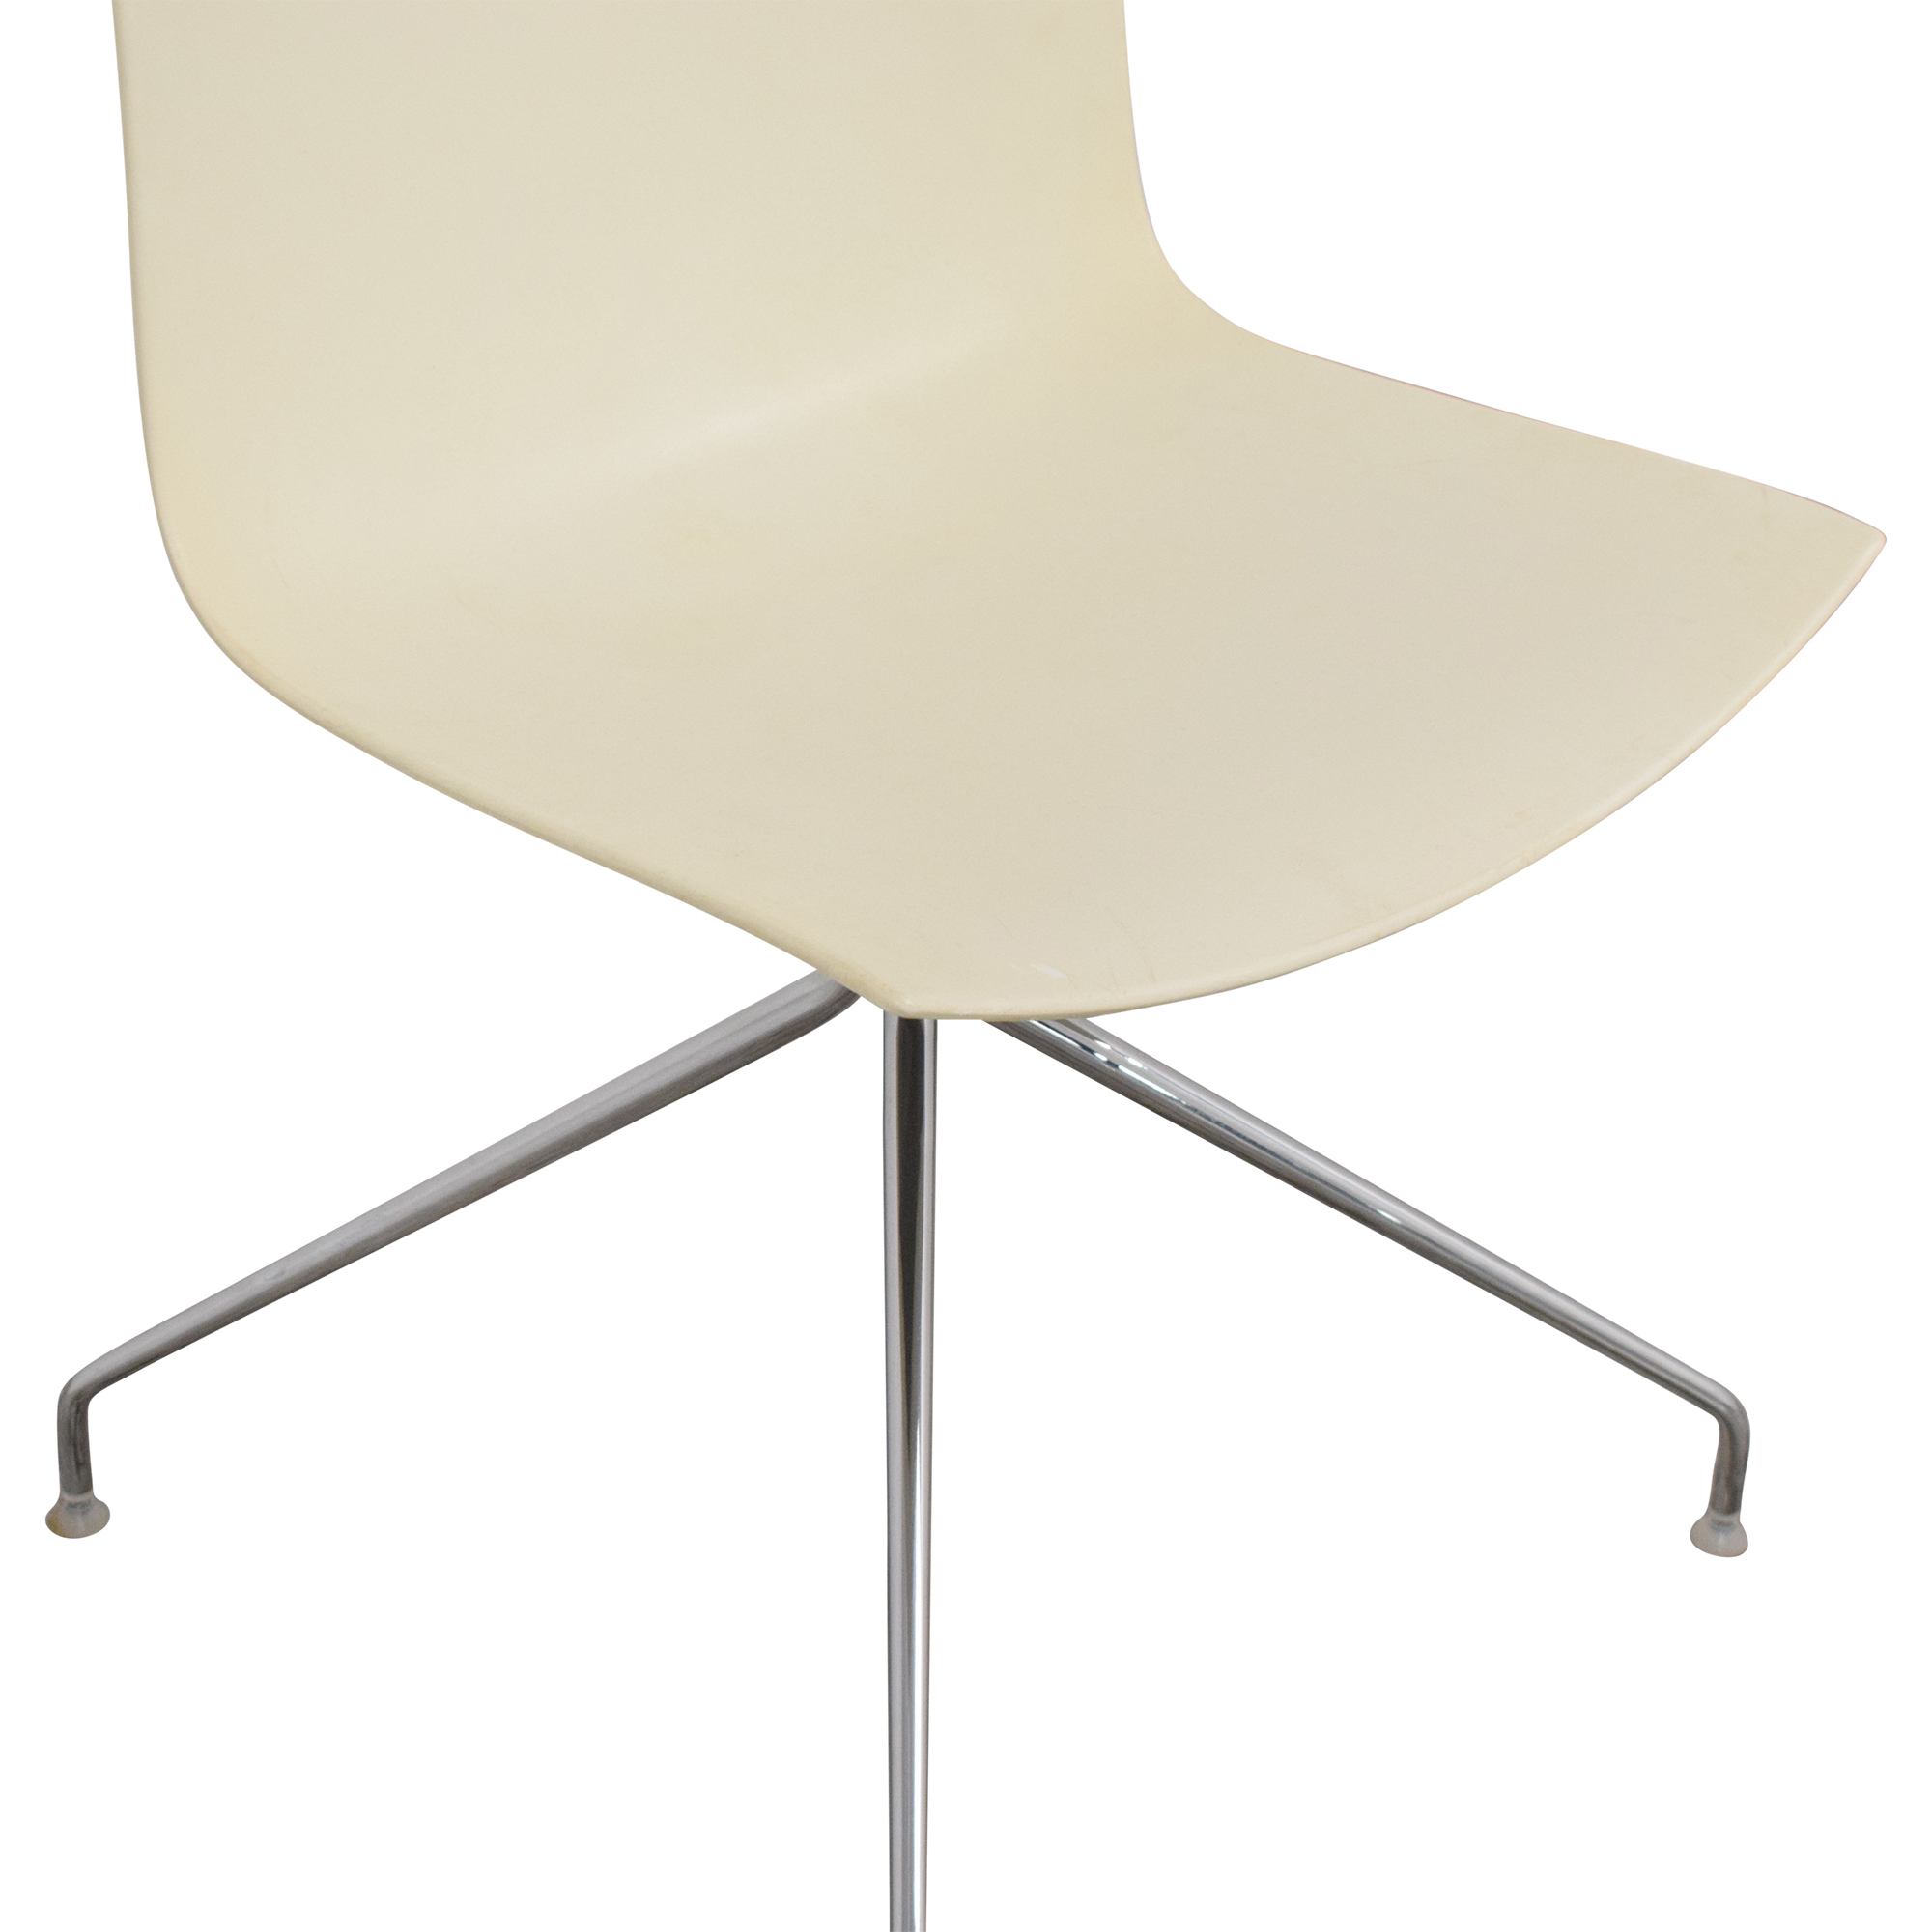 Arper Arper Catifa 46 Trestle Swivel Chair Chairs